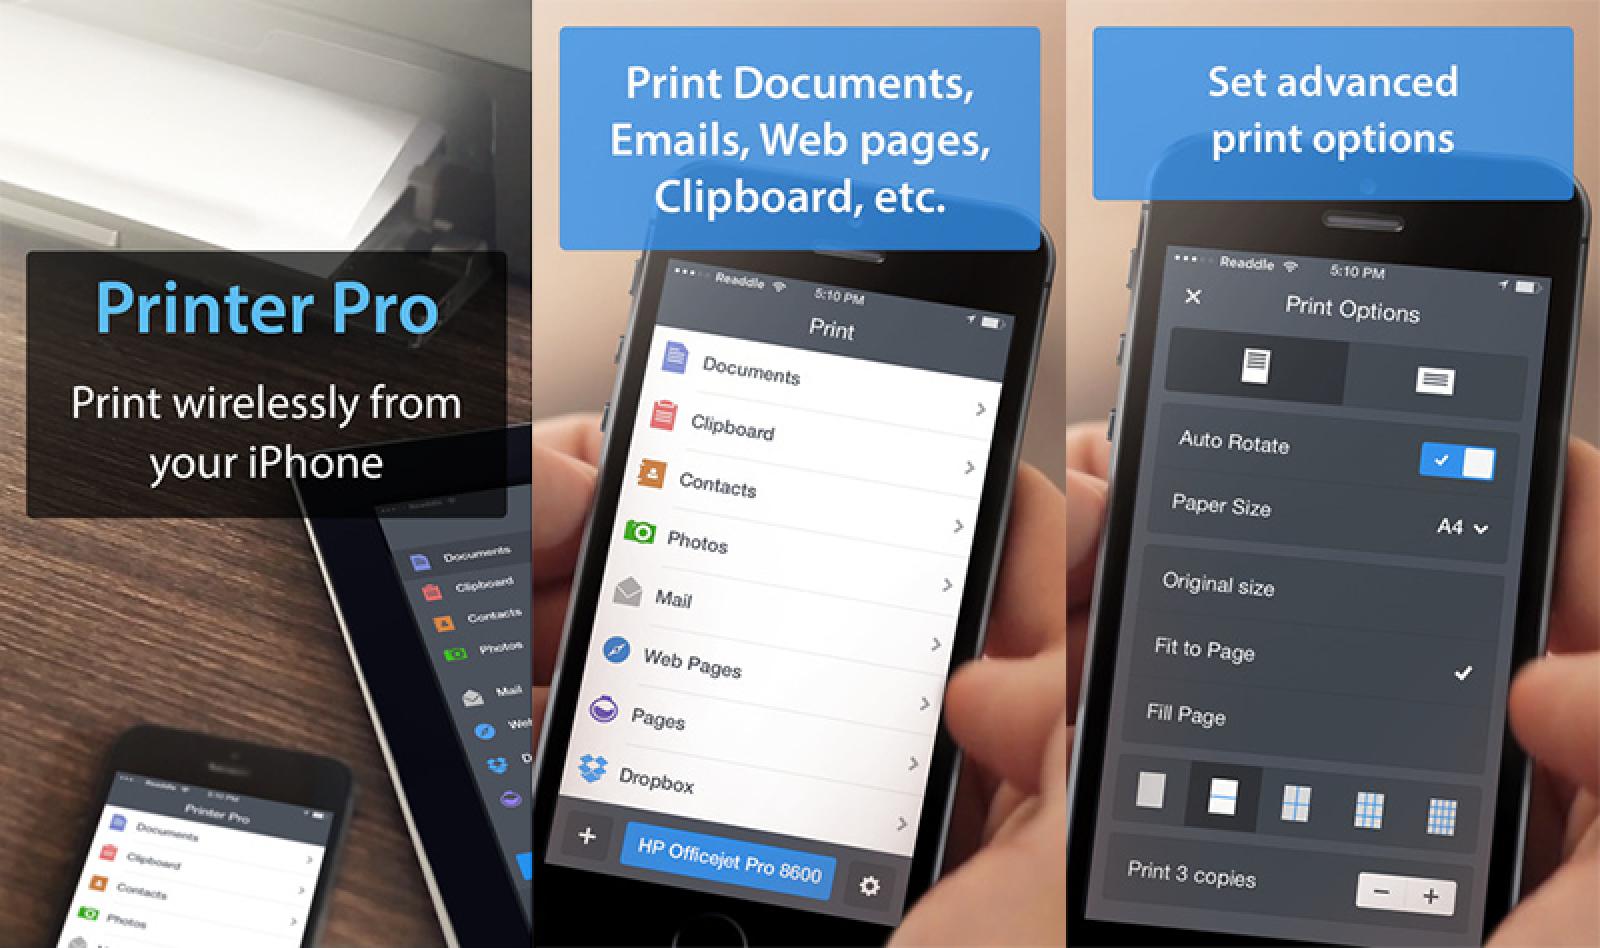 Mobile Printing App 'Printer Pro' Named Apple's Free App of